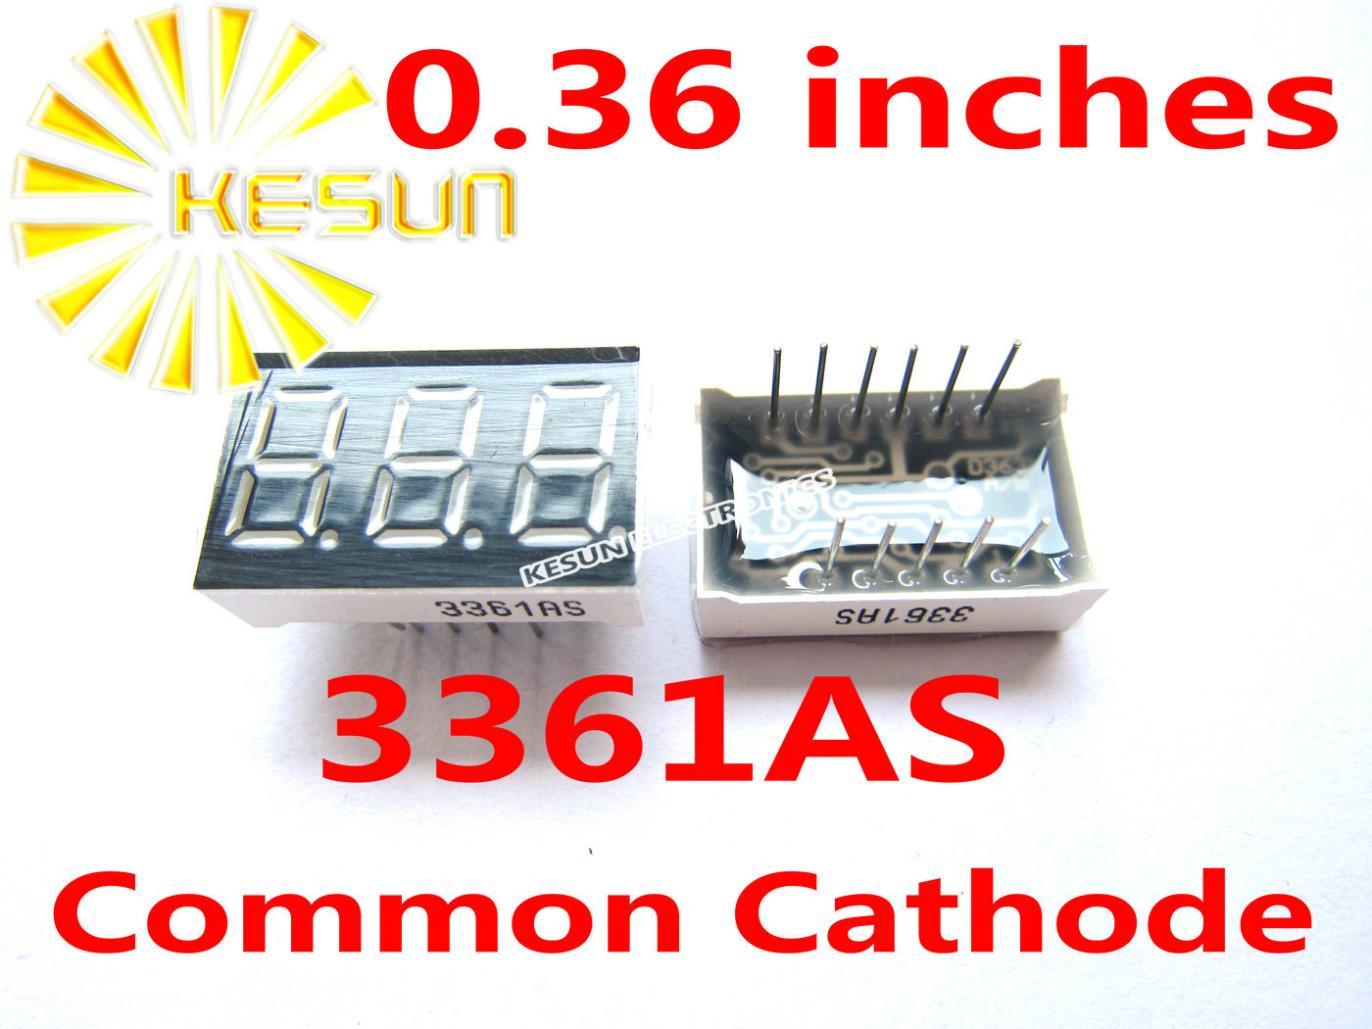 100PCS X 0.36 Inches Red Green Blue 3 Digital Tube LED Display Module 3361AS 3361BS 3361AG 3361BG 3361AB 3361BB